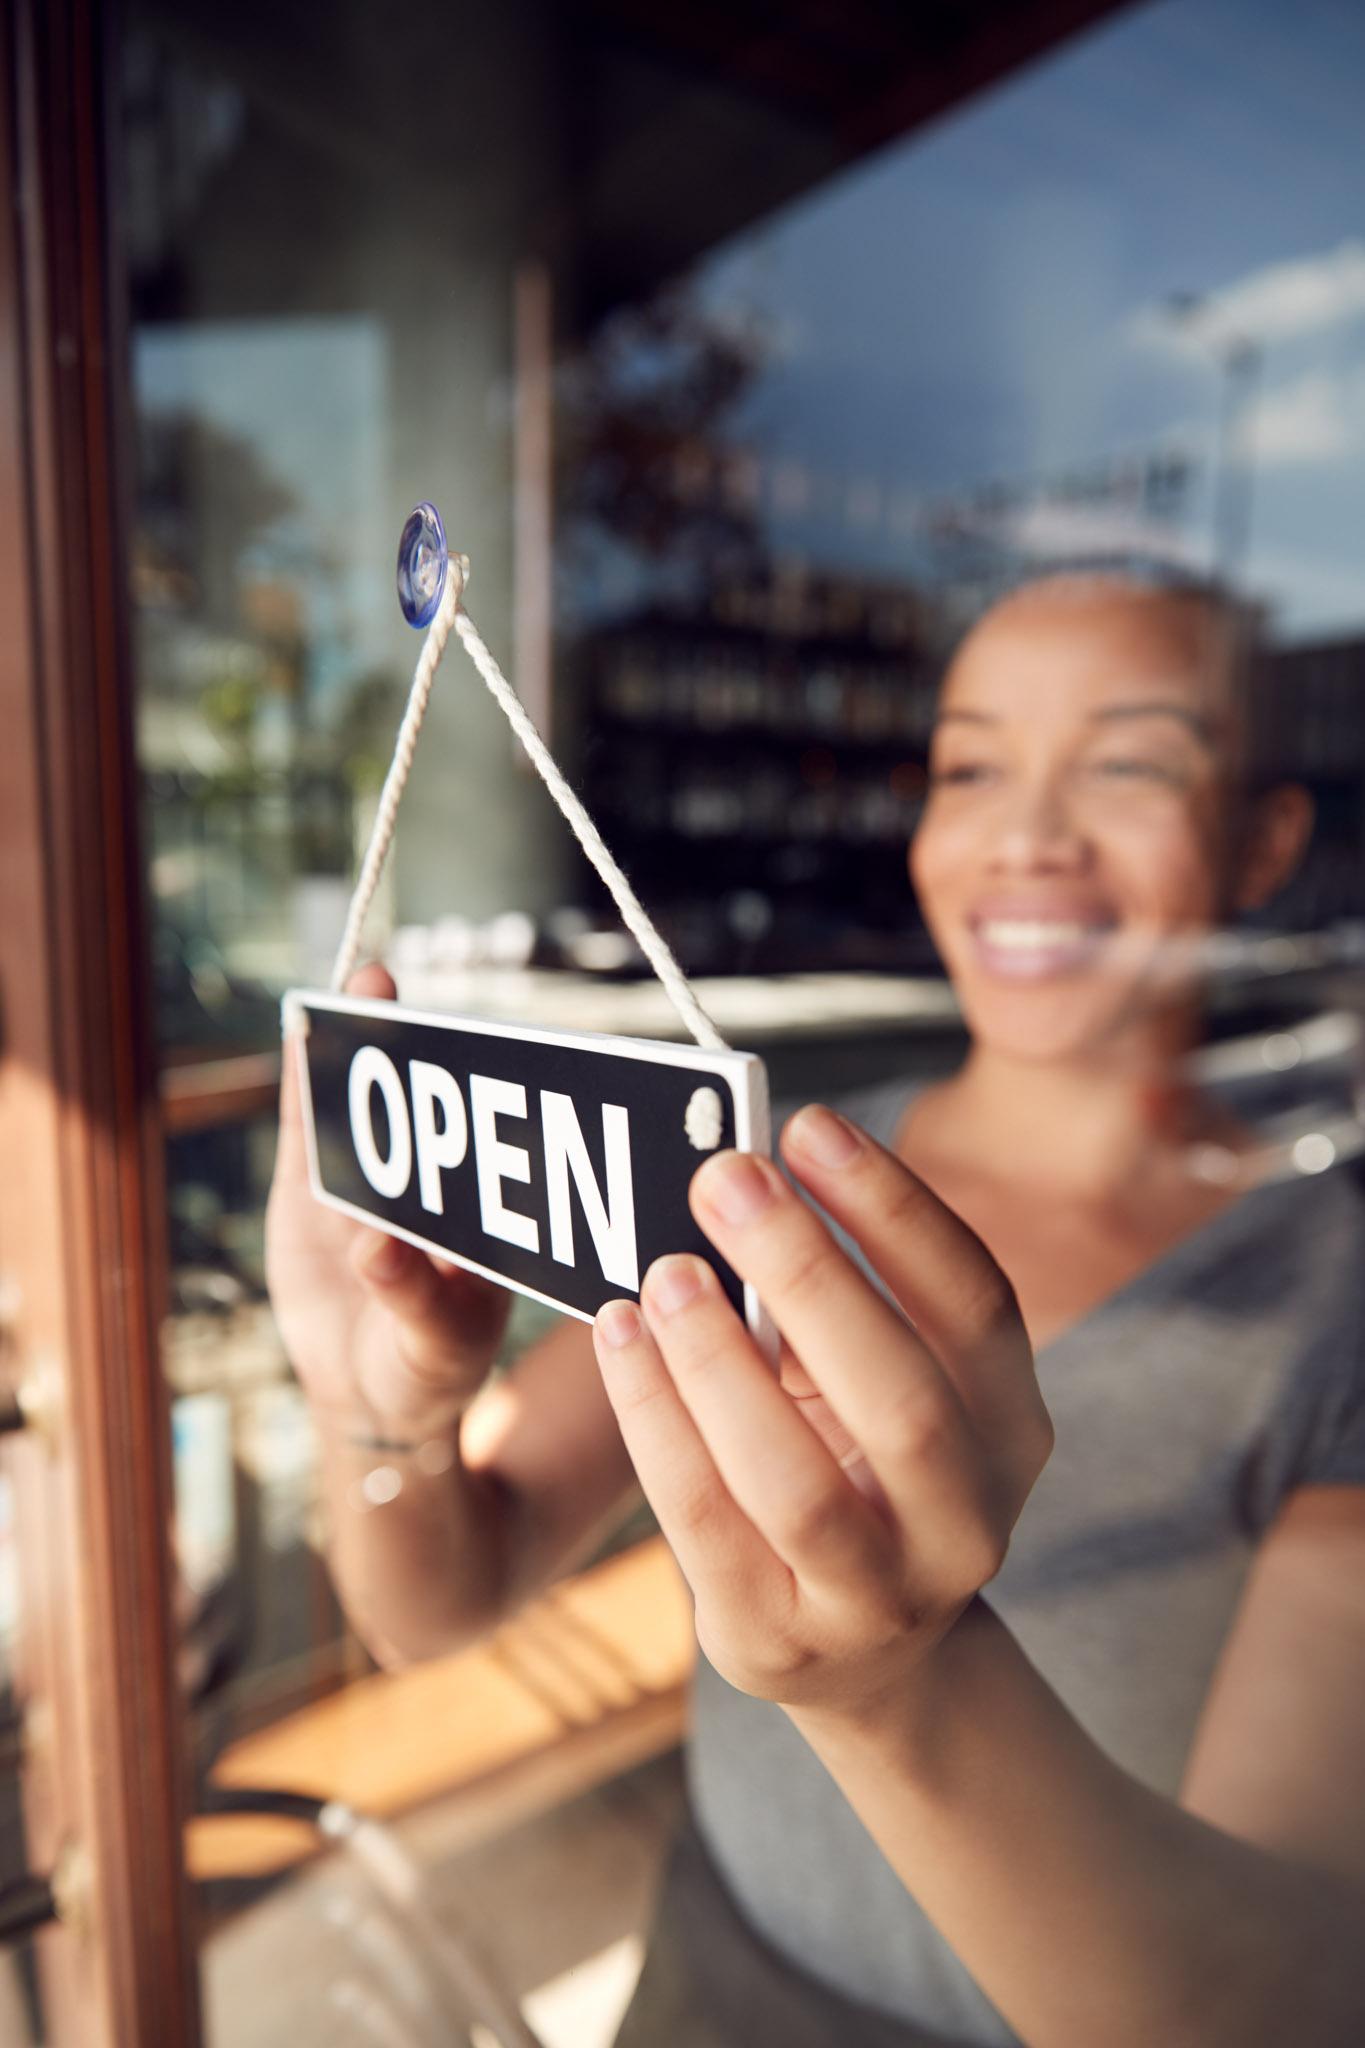 Affordable Digital Payment Alternative